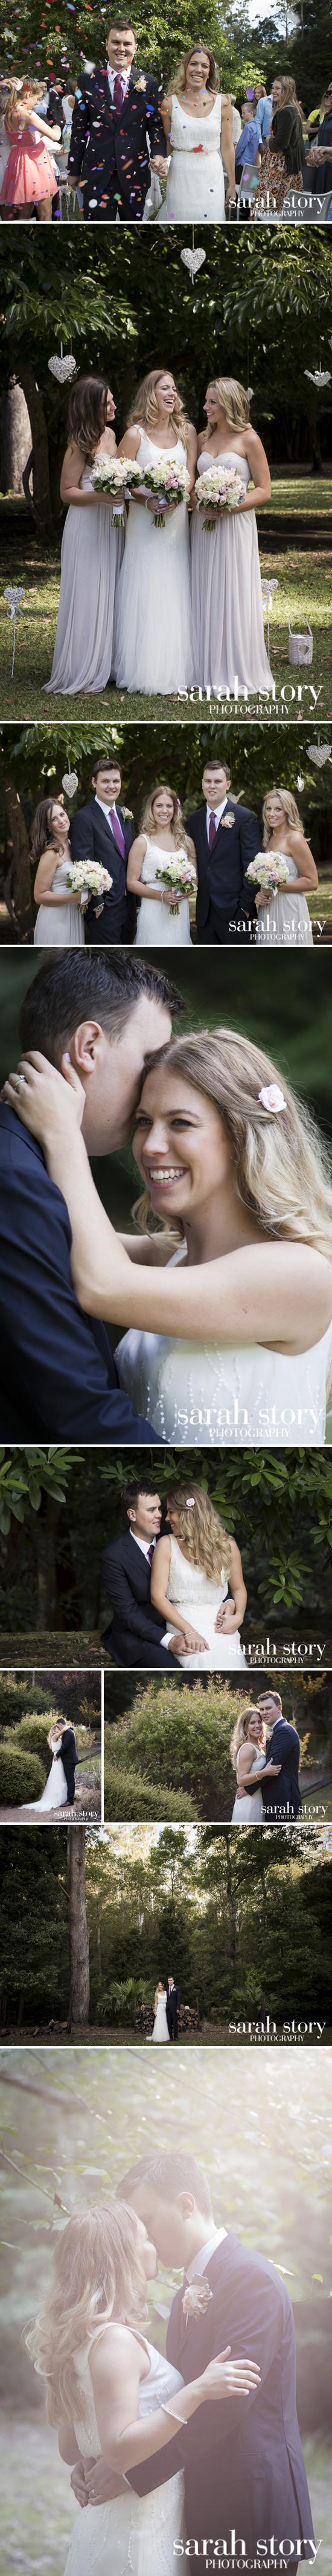 Young Wedding-Blog-Lilyvale Wedding Photography 11